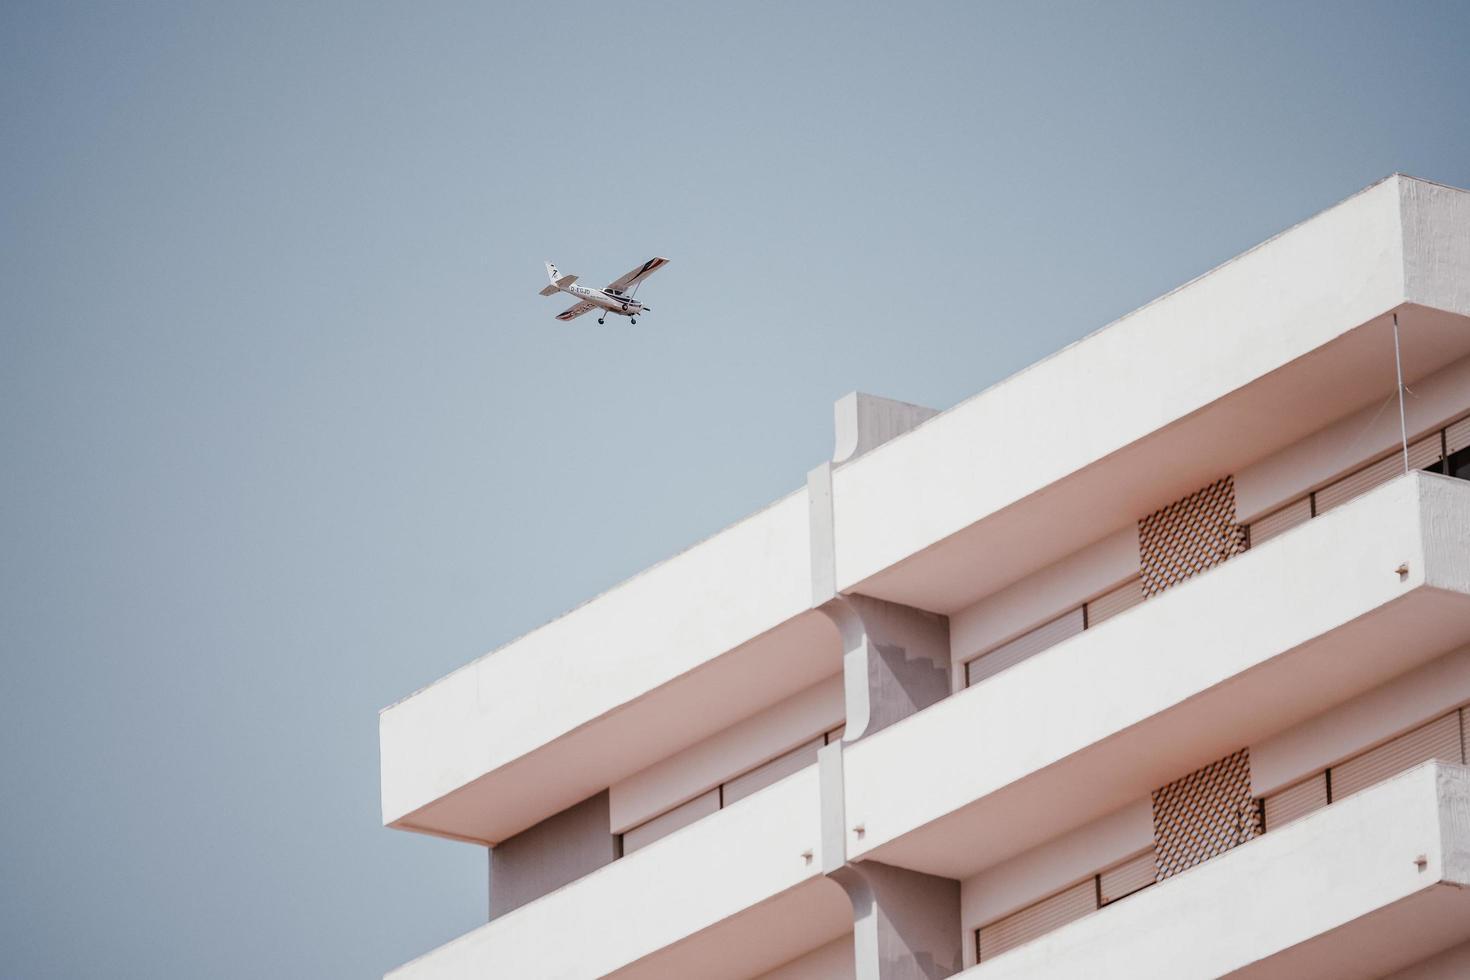 White monoplane over building photo